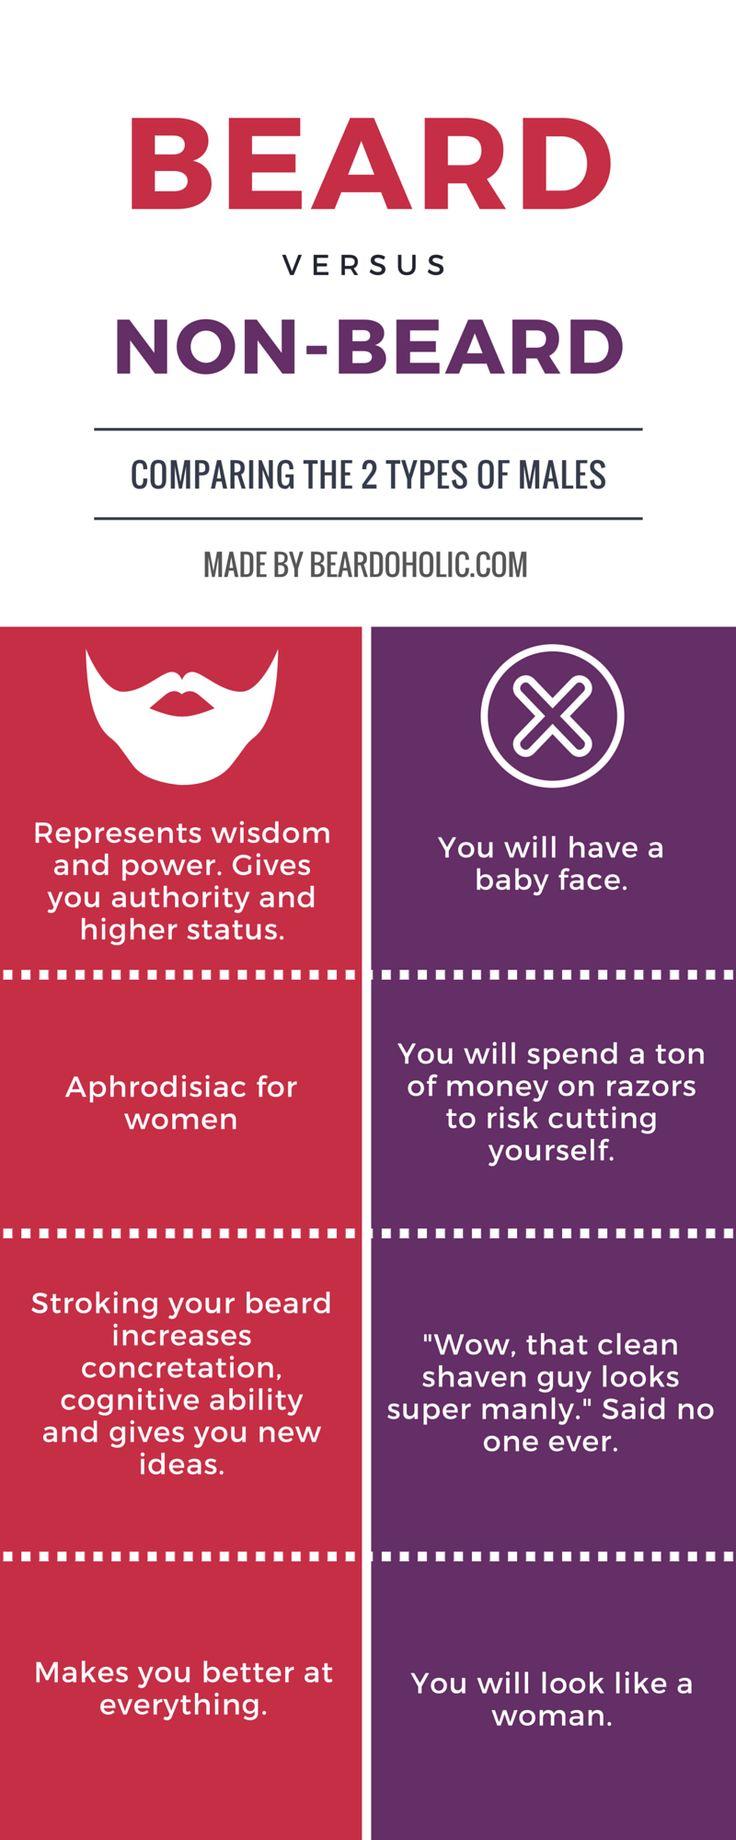 Beard vs Non-Beard on beardoholic.com